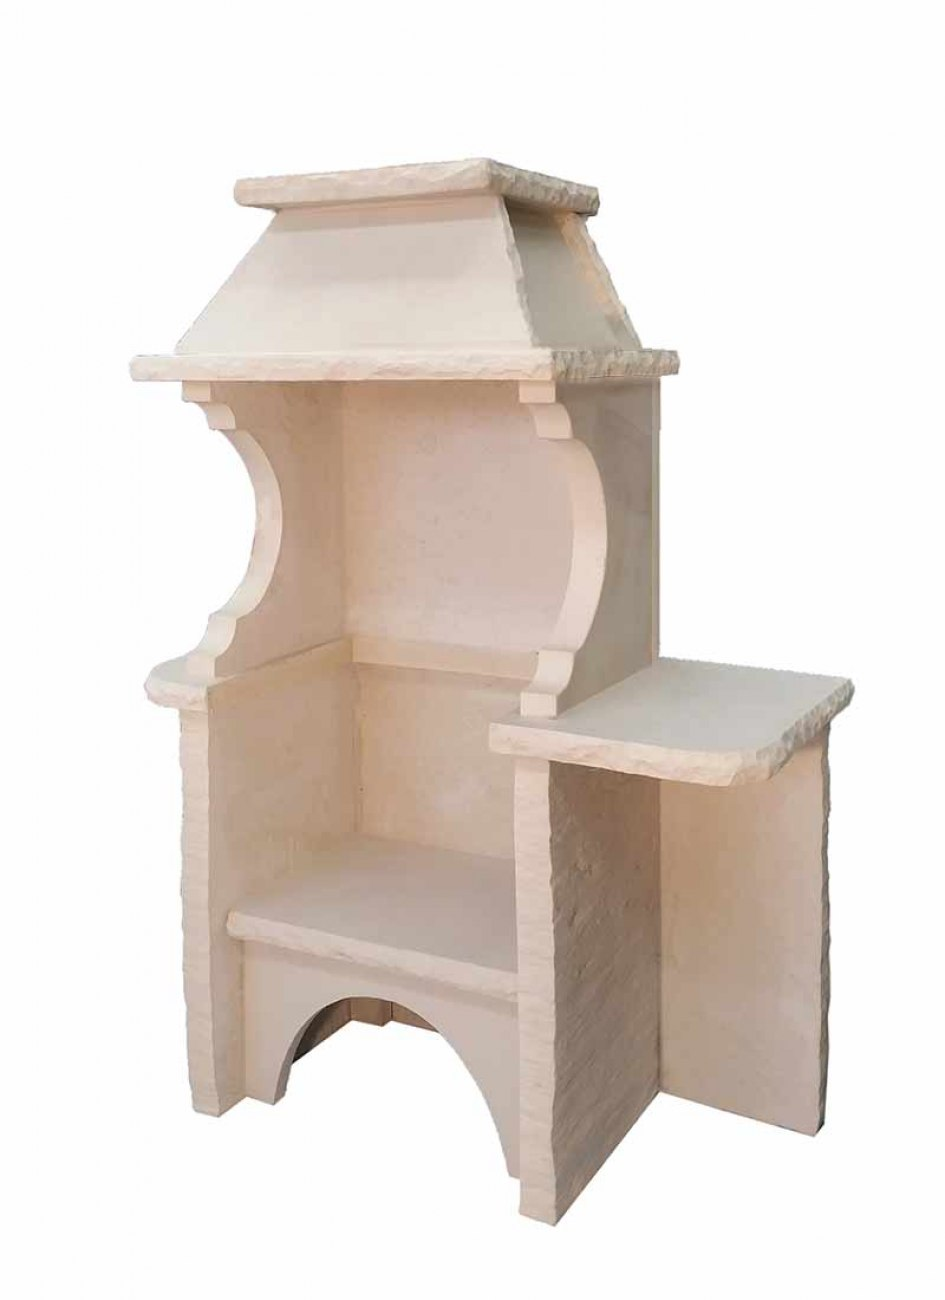 barbecue en dur moderne image de barbecue en pierre du portugal prf construire un foyer. Black Bedroom Furniture Sets. Home Design Ideas